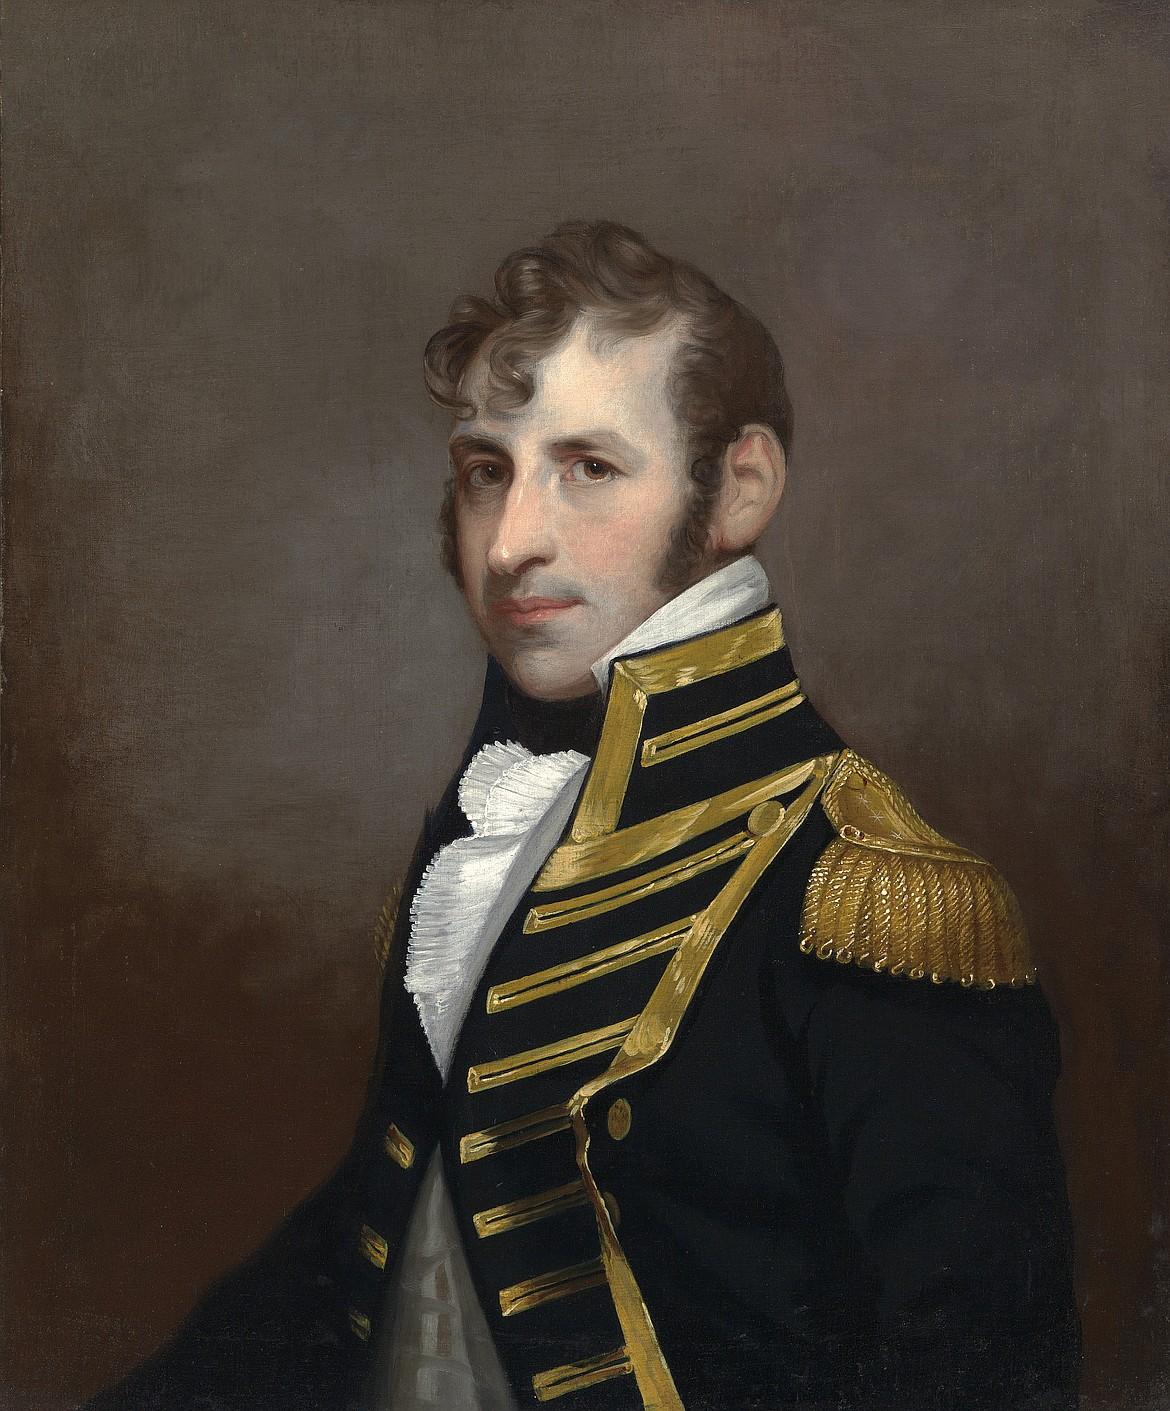 Painting by Charles Bird King (1785-1862) of U.S. Navy hero Stephen Decatur Jr. (1779-1820).